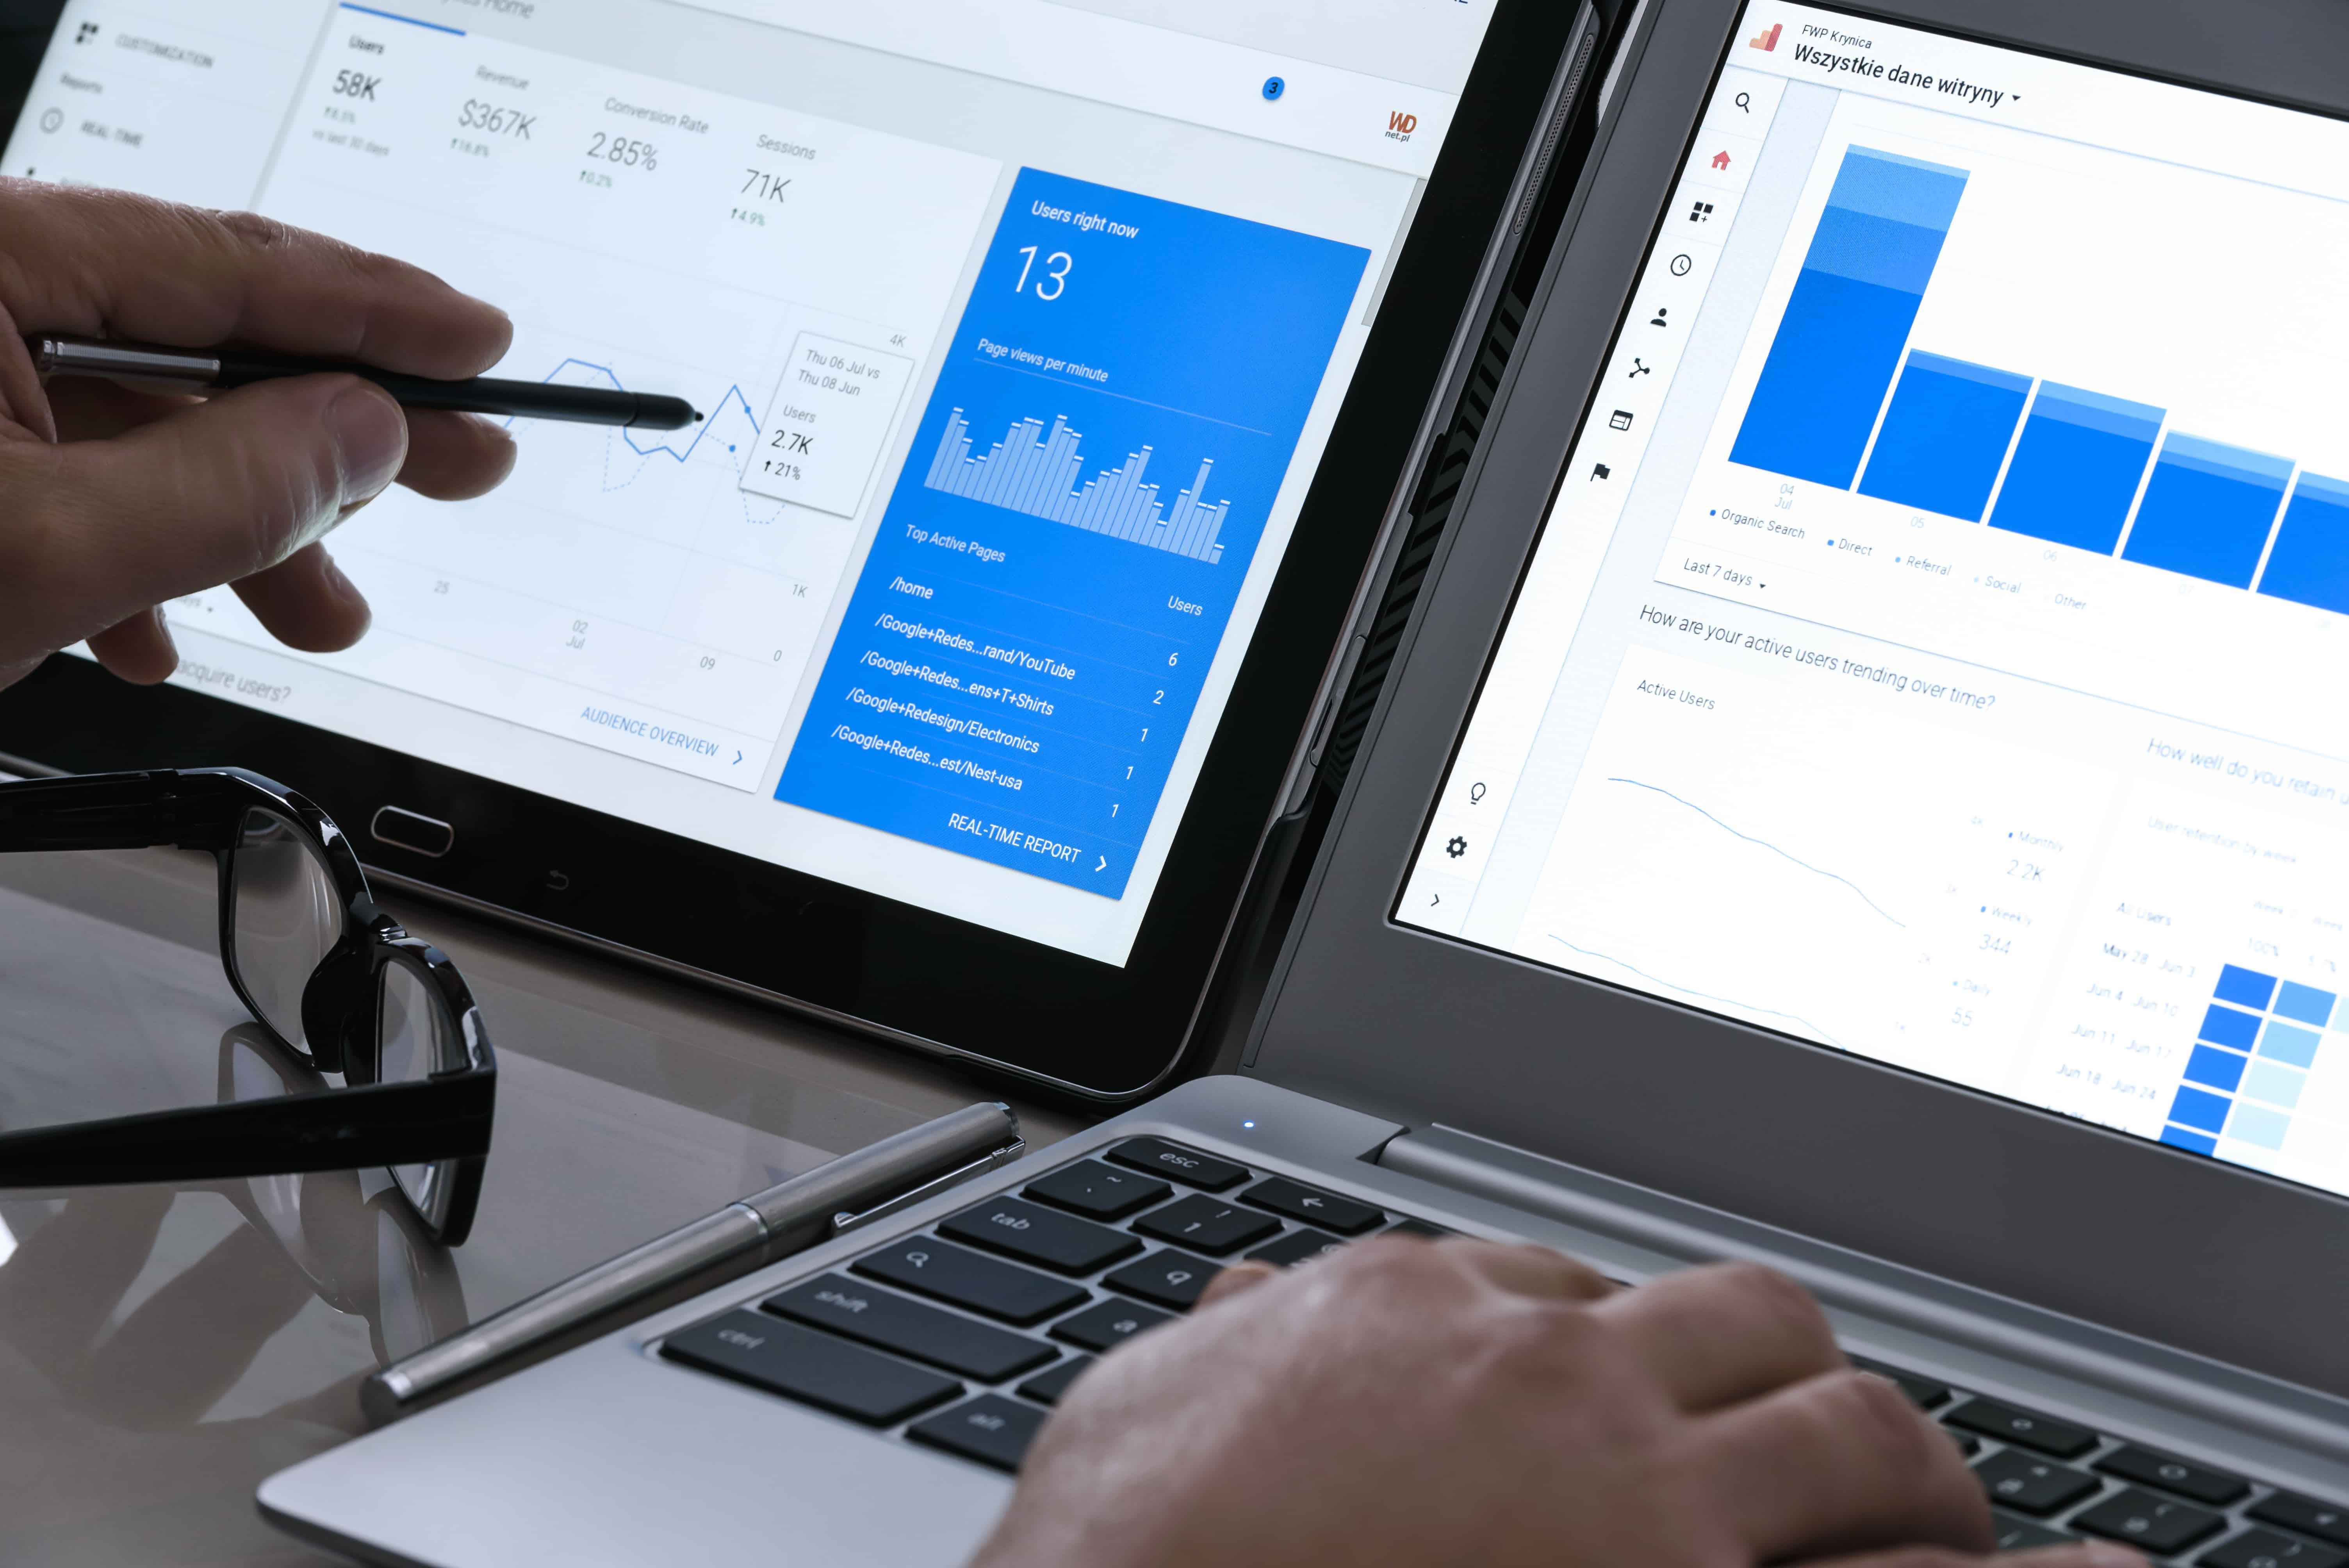 Google Ads Smart Bidding in action Web Worx Labs - A Digital Marketing Agency